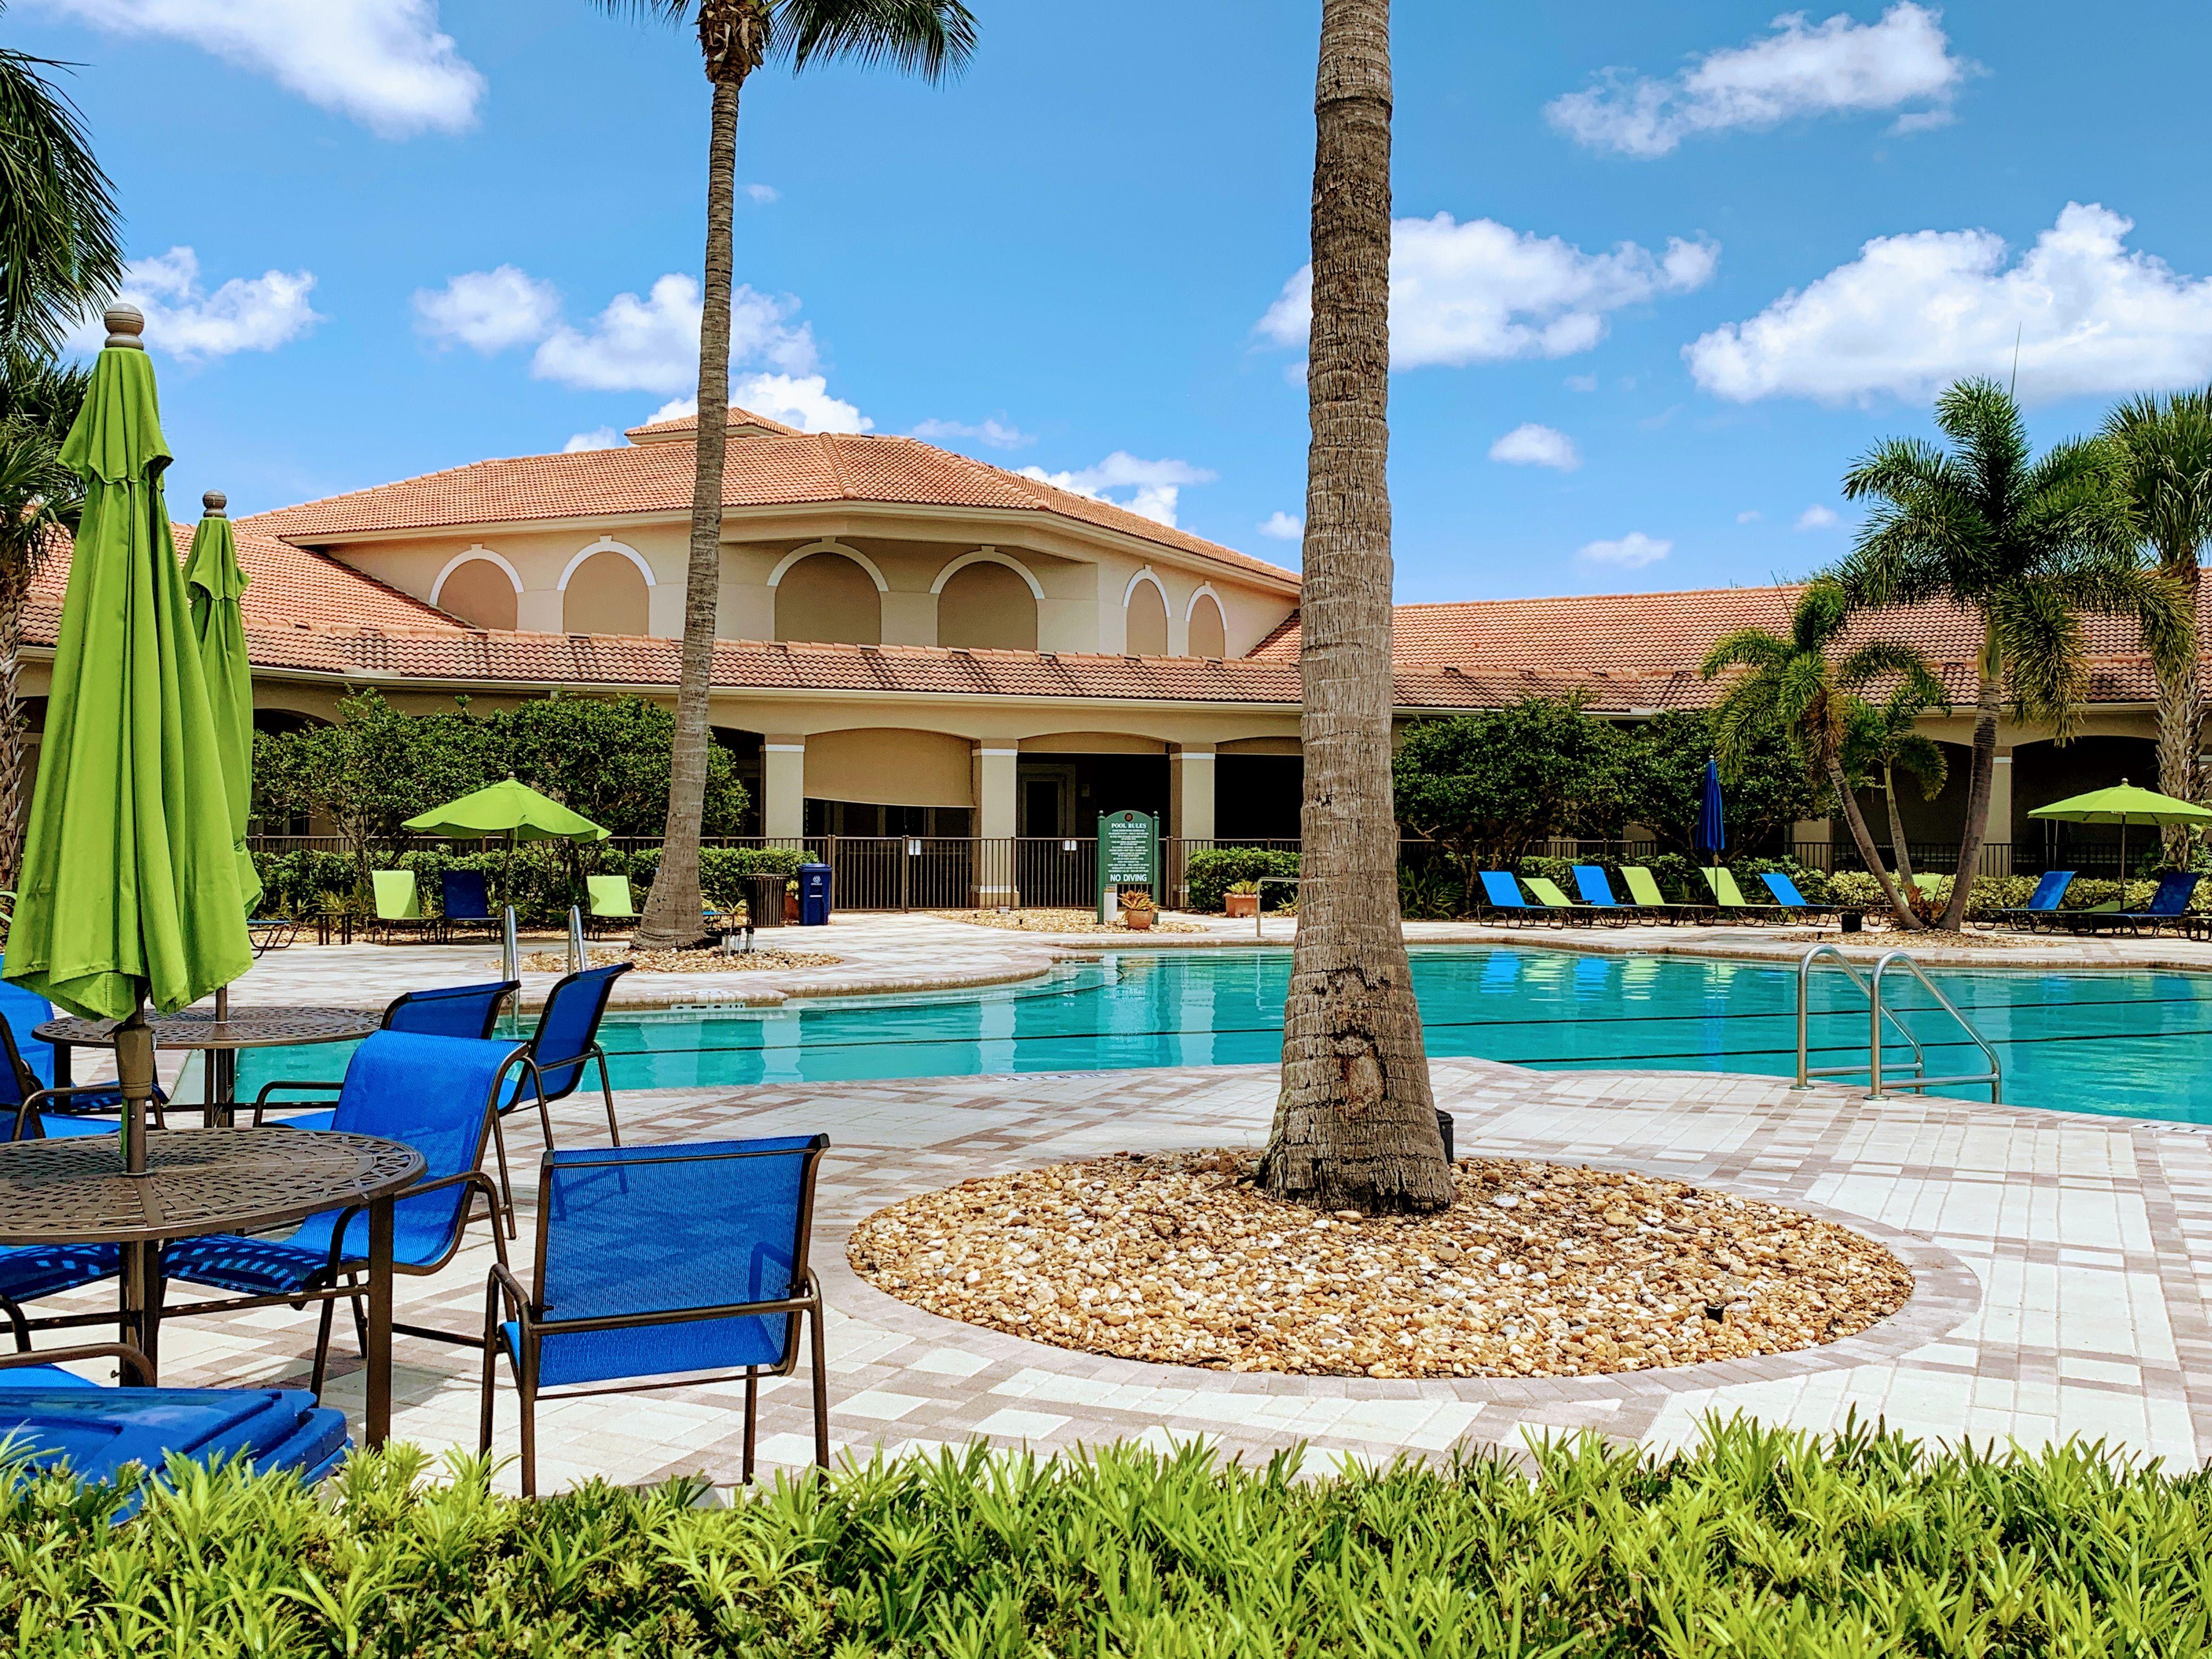 Island Club Resort Lap Pool Residential Real Estate Estate Homes Real Estate